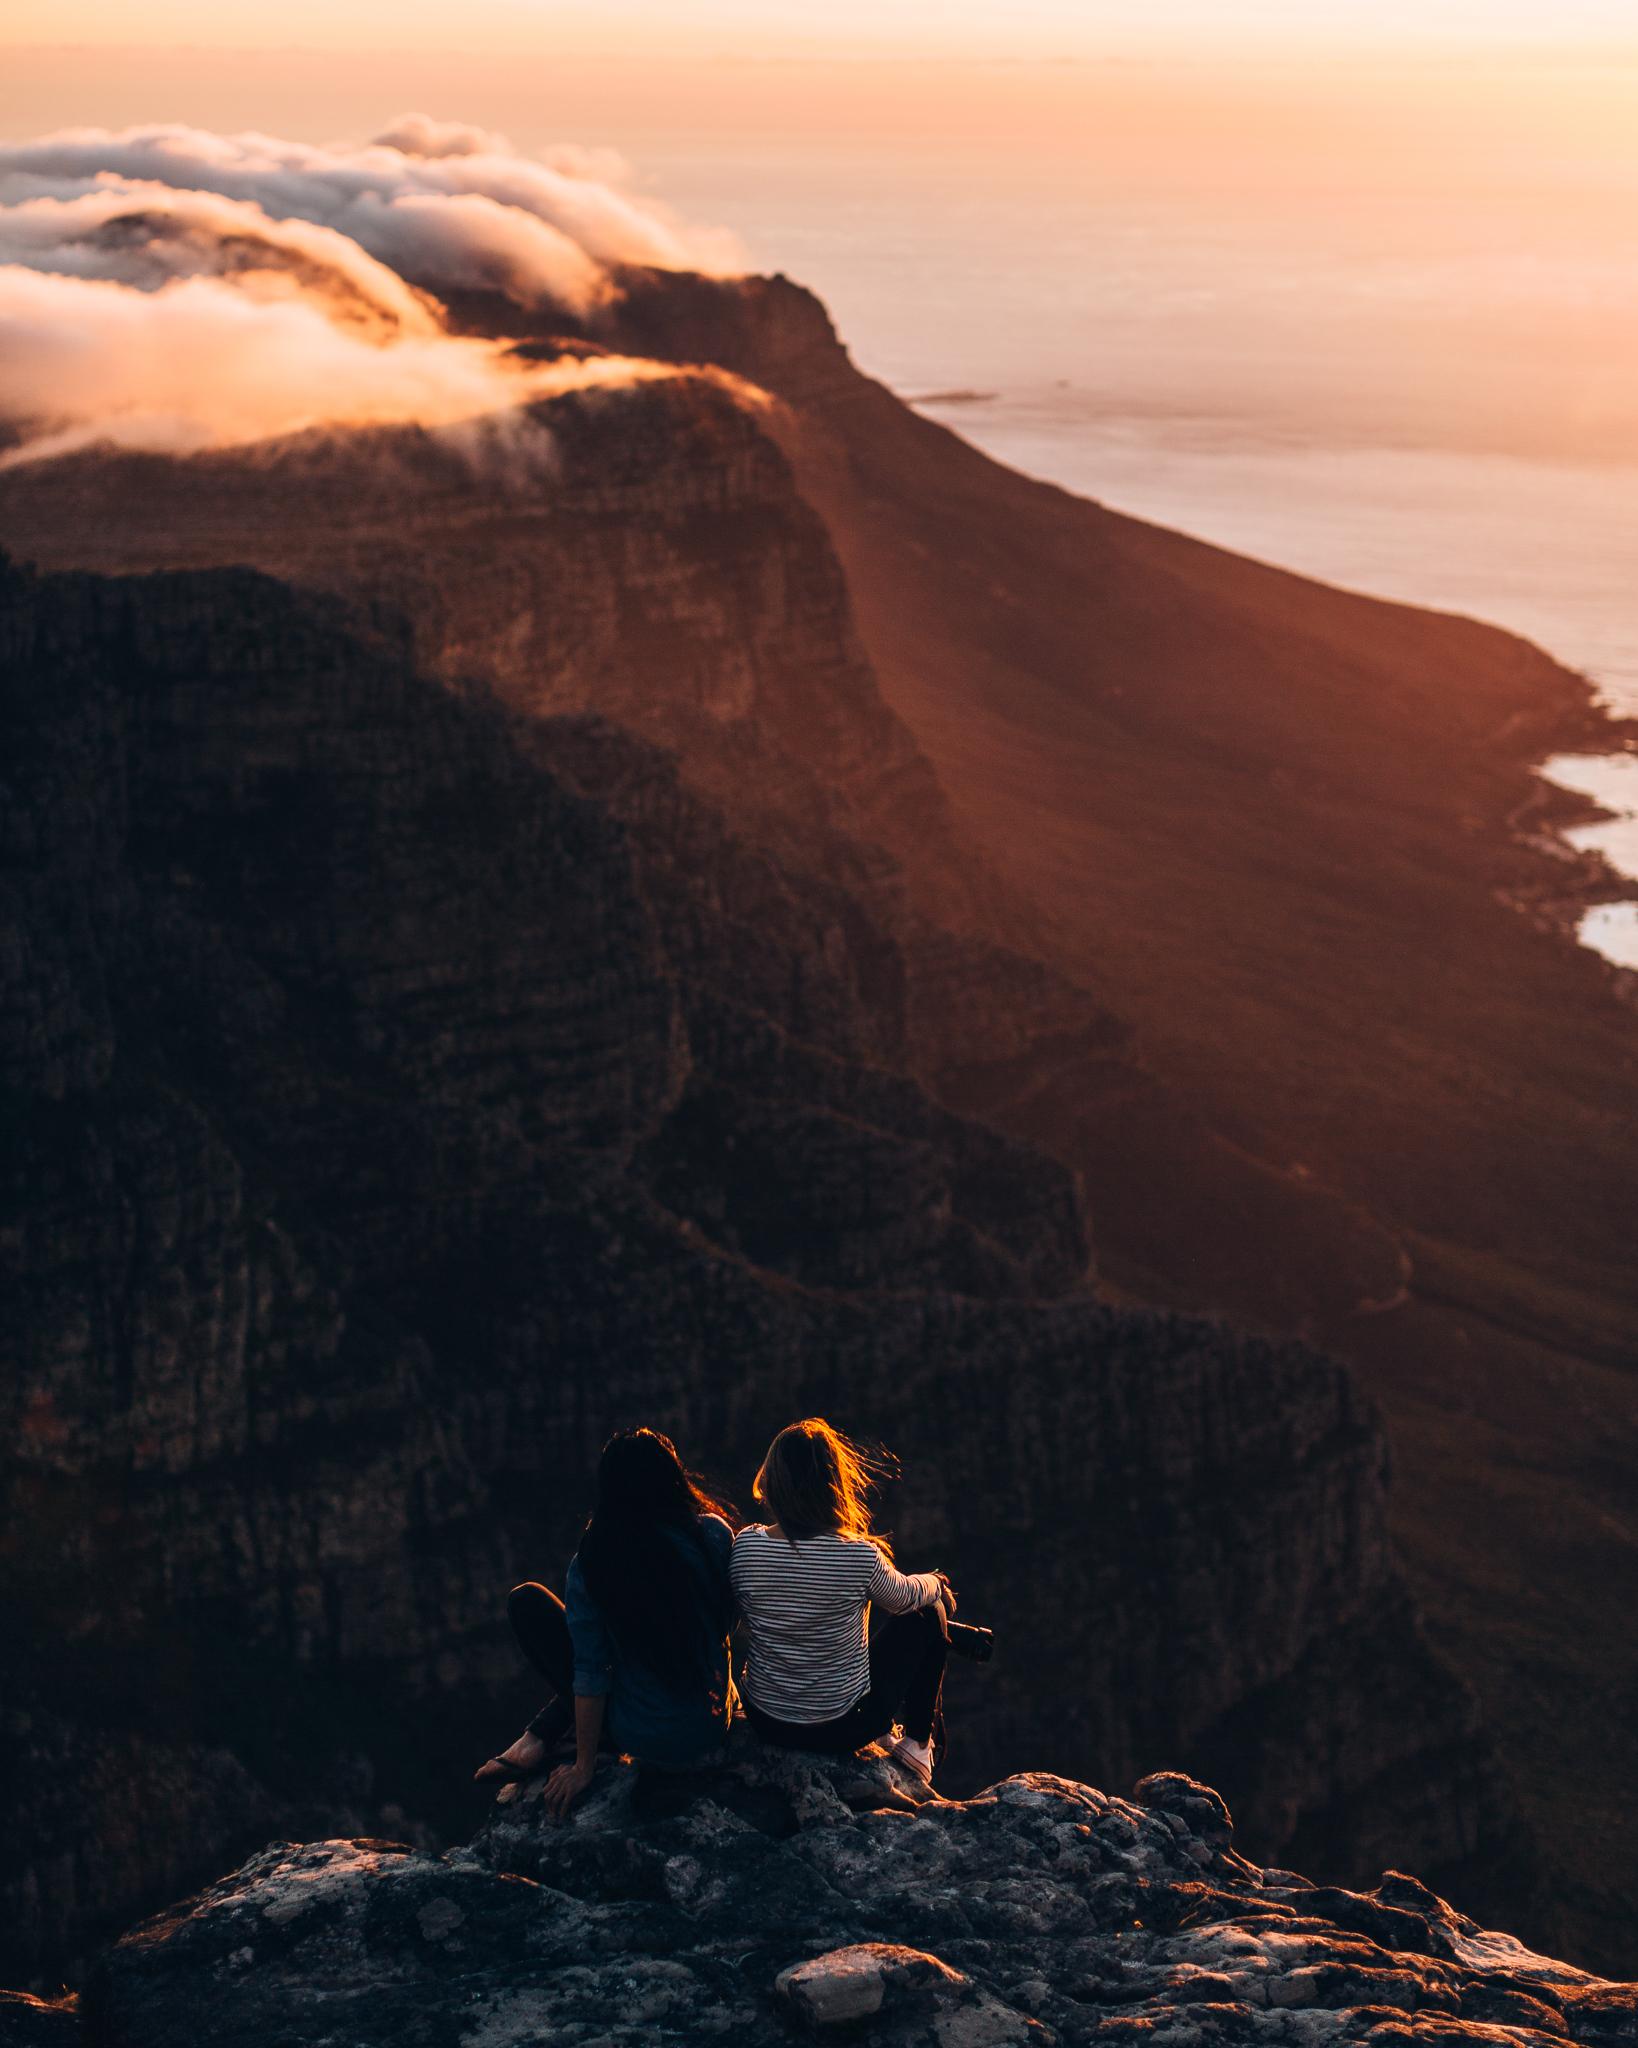 Melissa_Findley-SouthAfrica-Blog-22.jpg